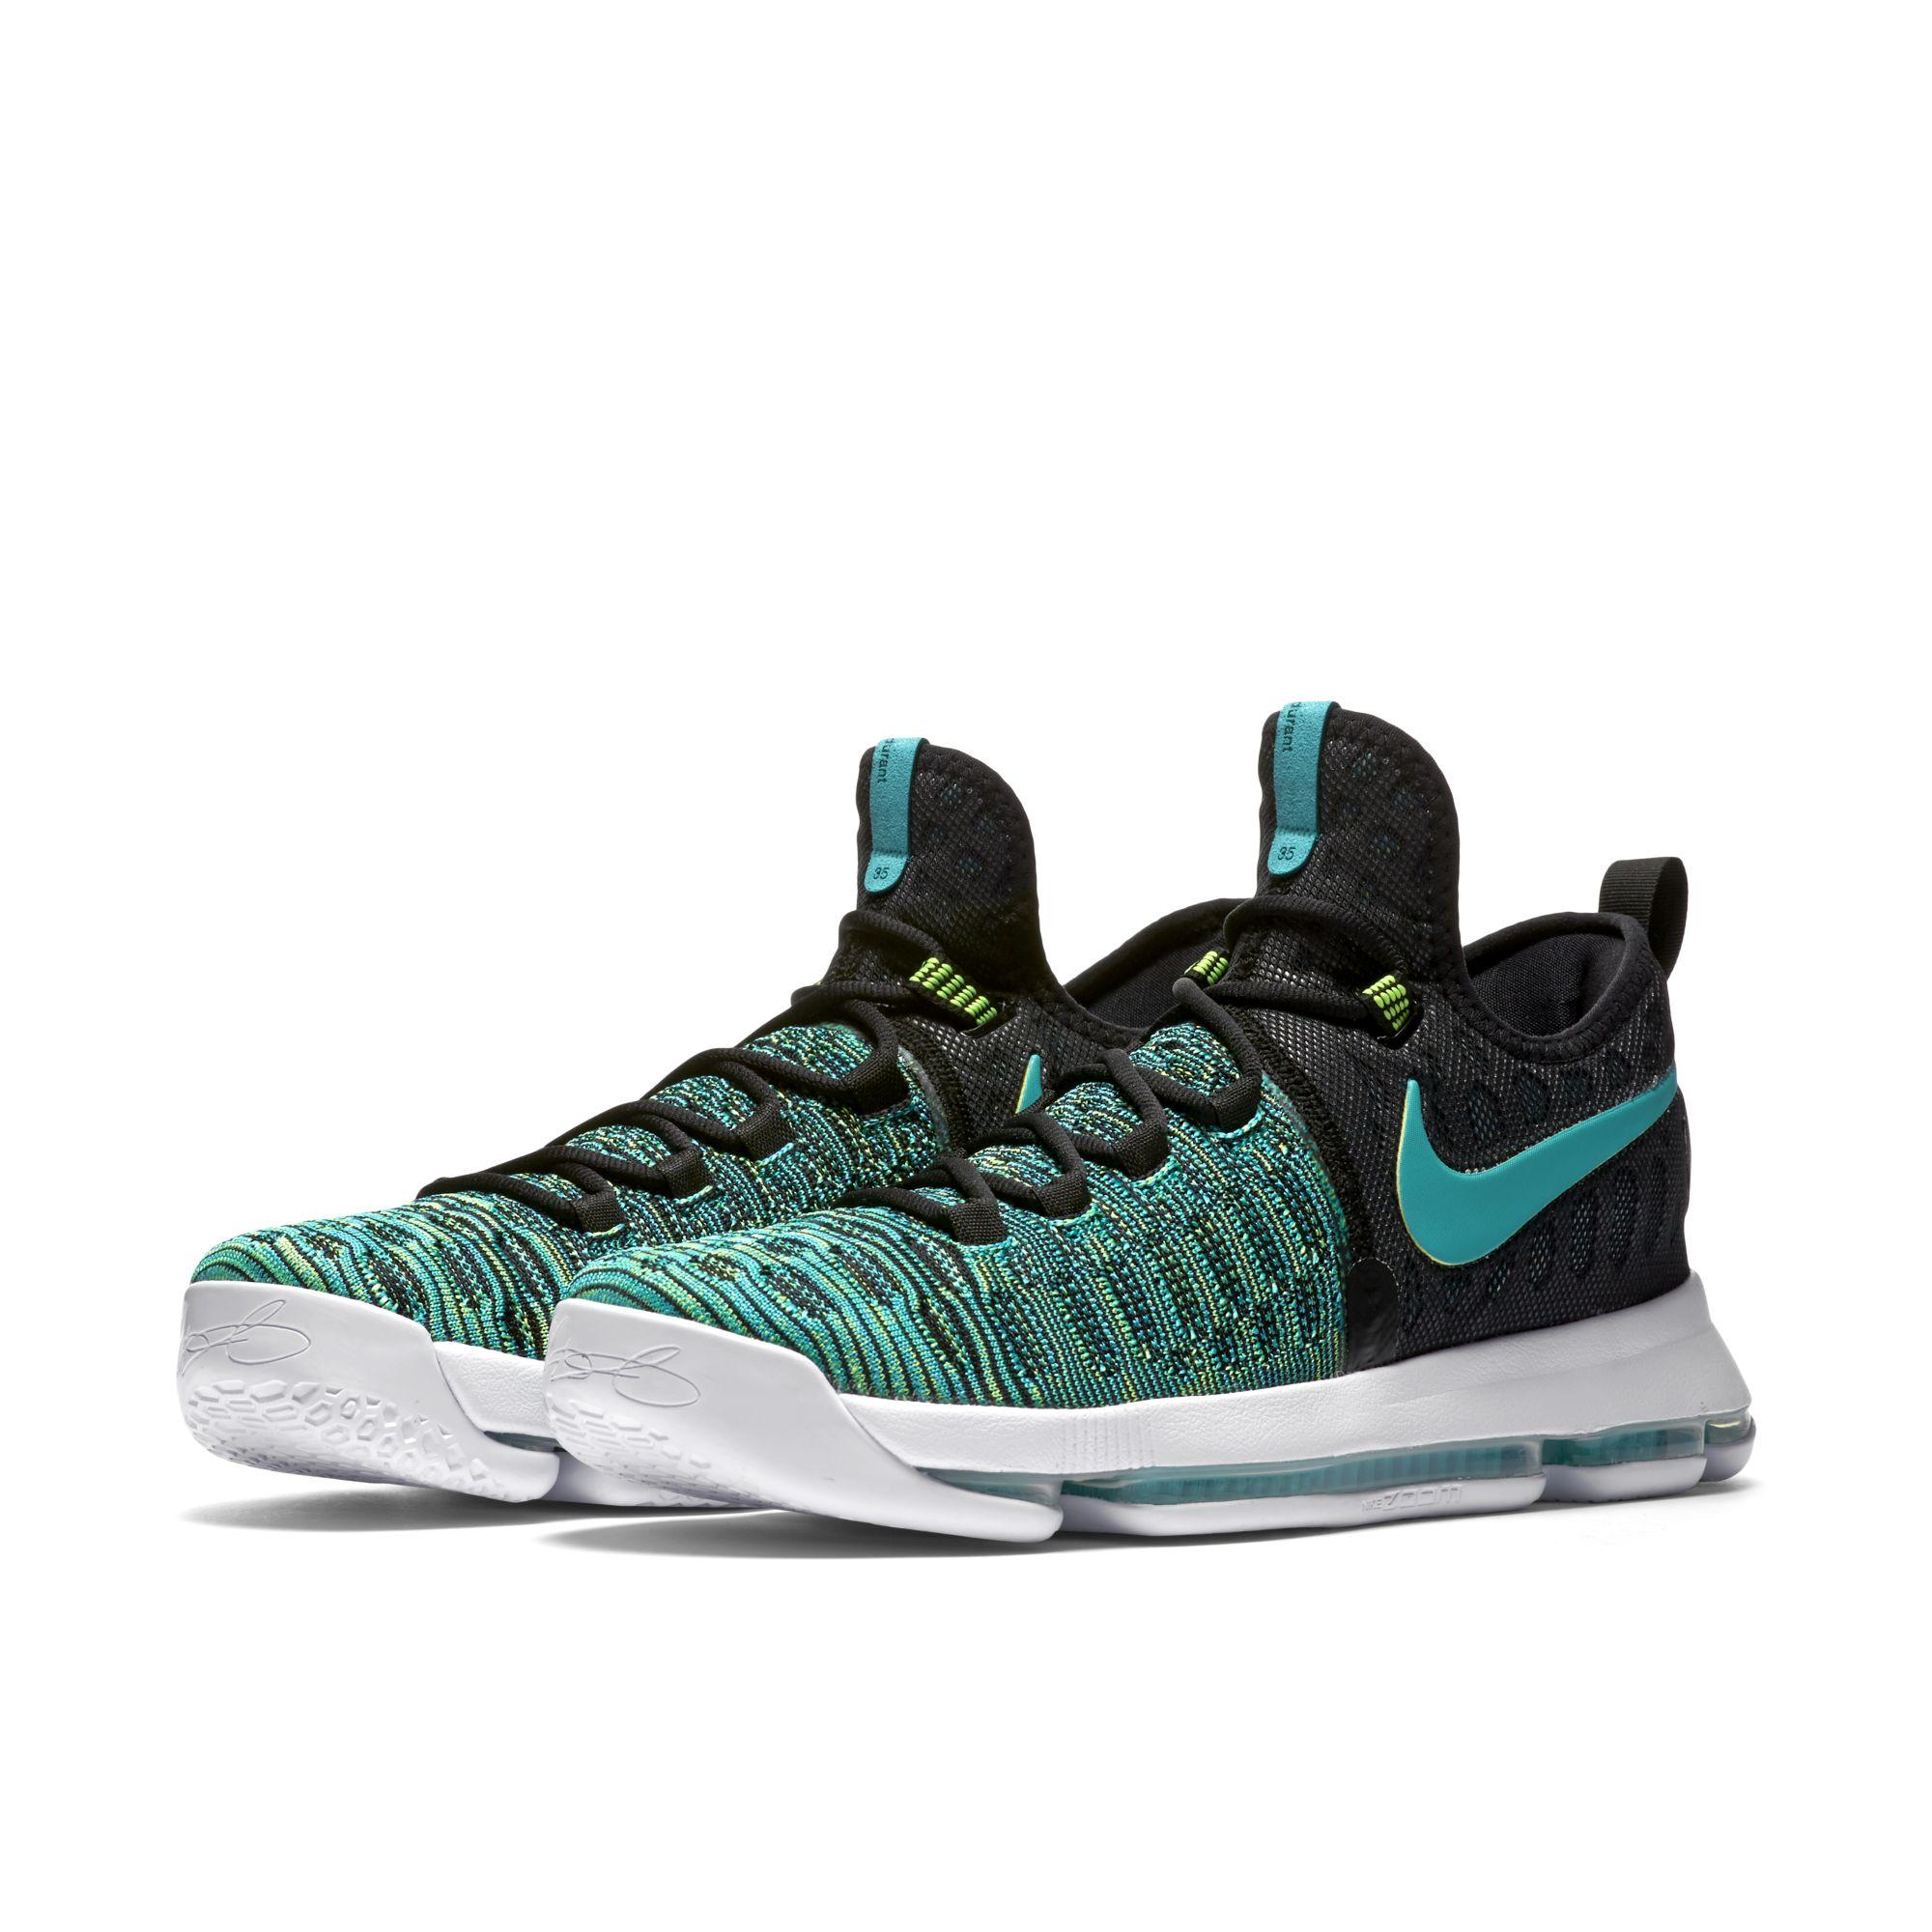 a44fd6b6abde Basketball   Kicks On Court   Nike   Release Reminder ...